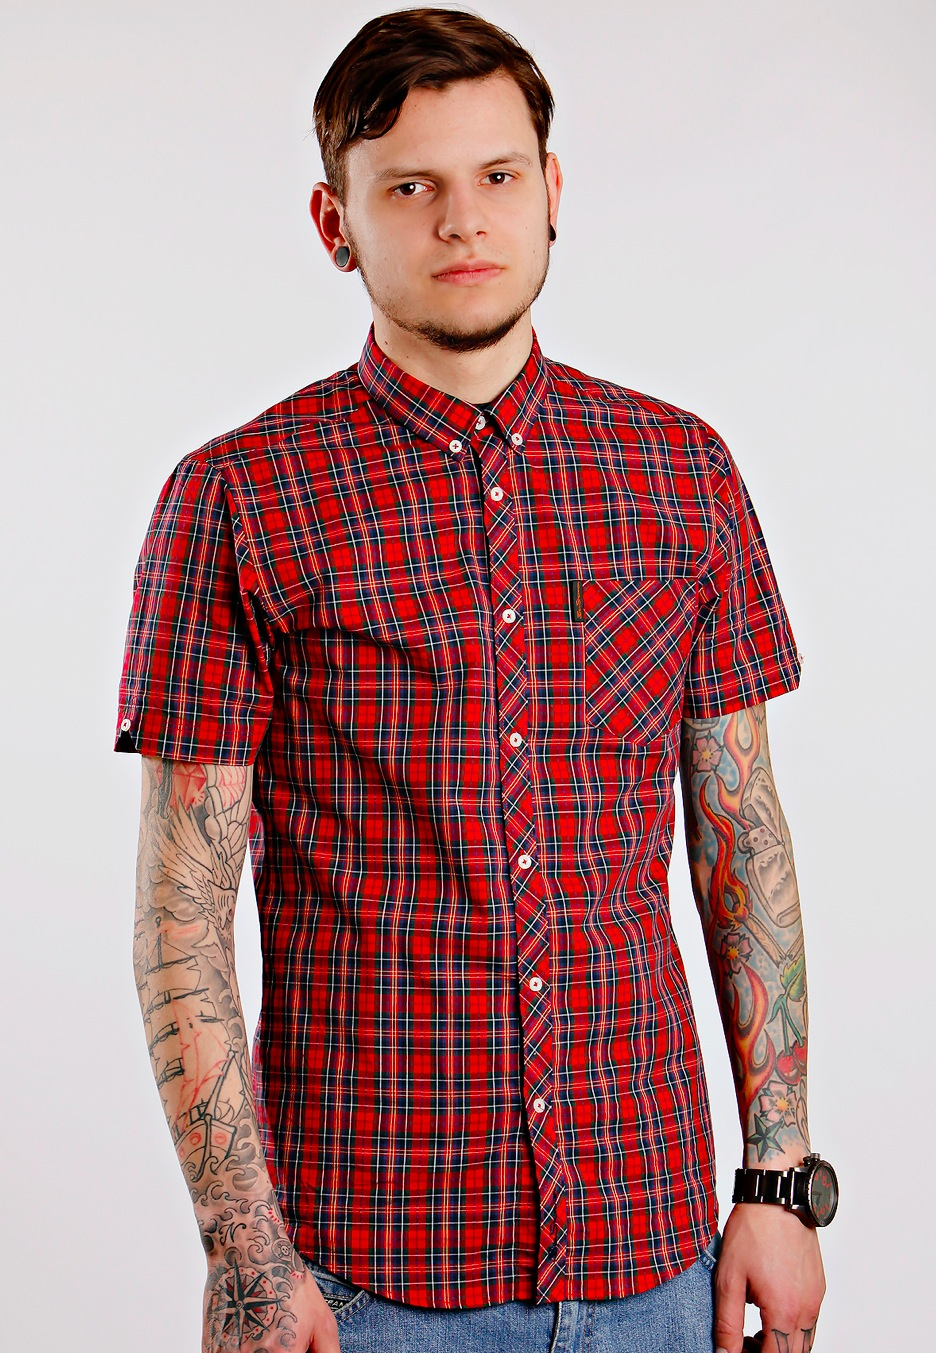 Color Changing Shirts >> Ben Sherman - Shirt S/S Sparkling Red - Shirt - Streetwear ...